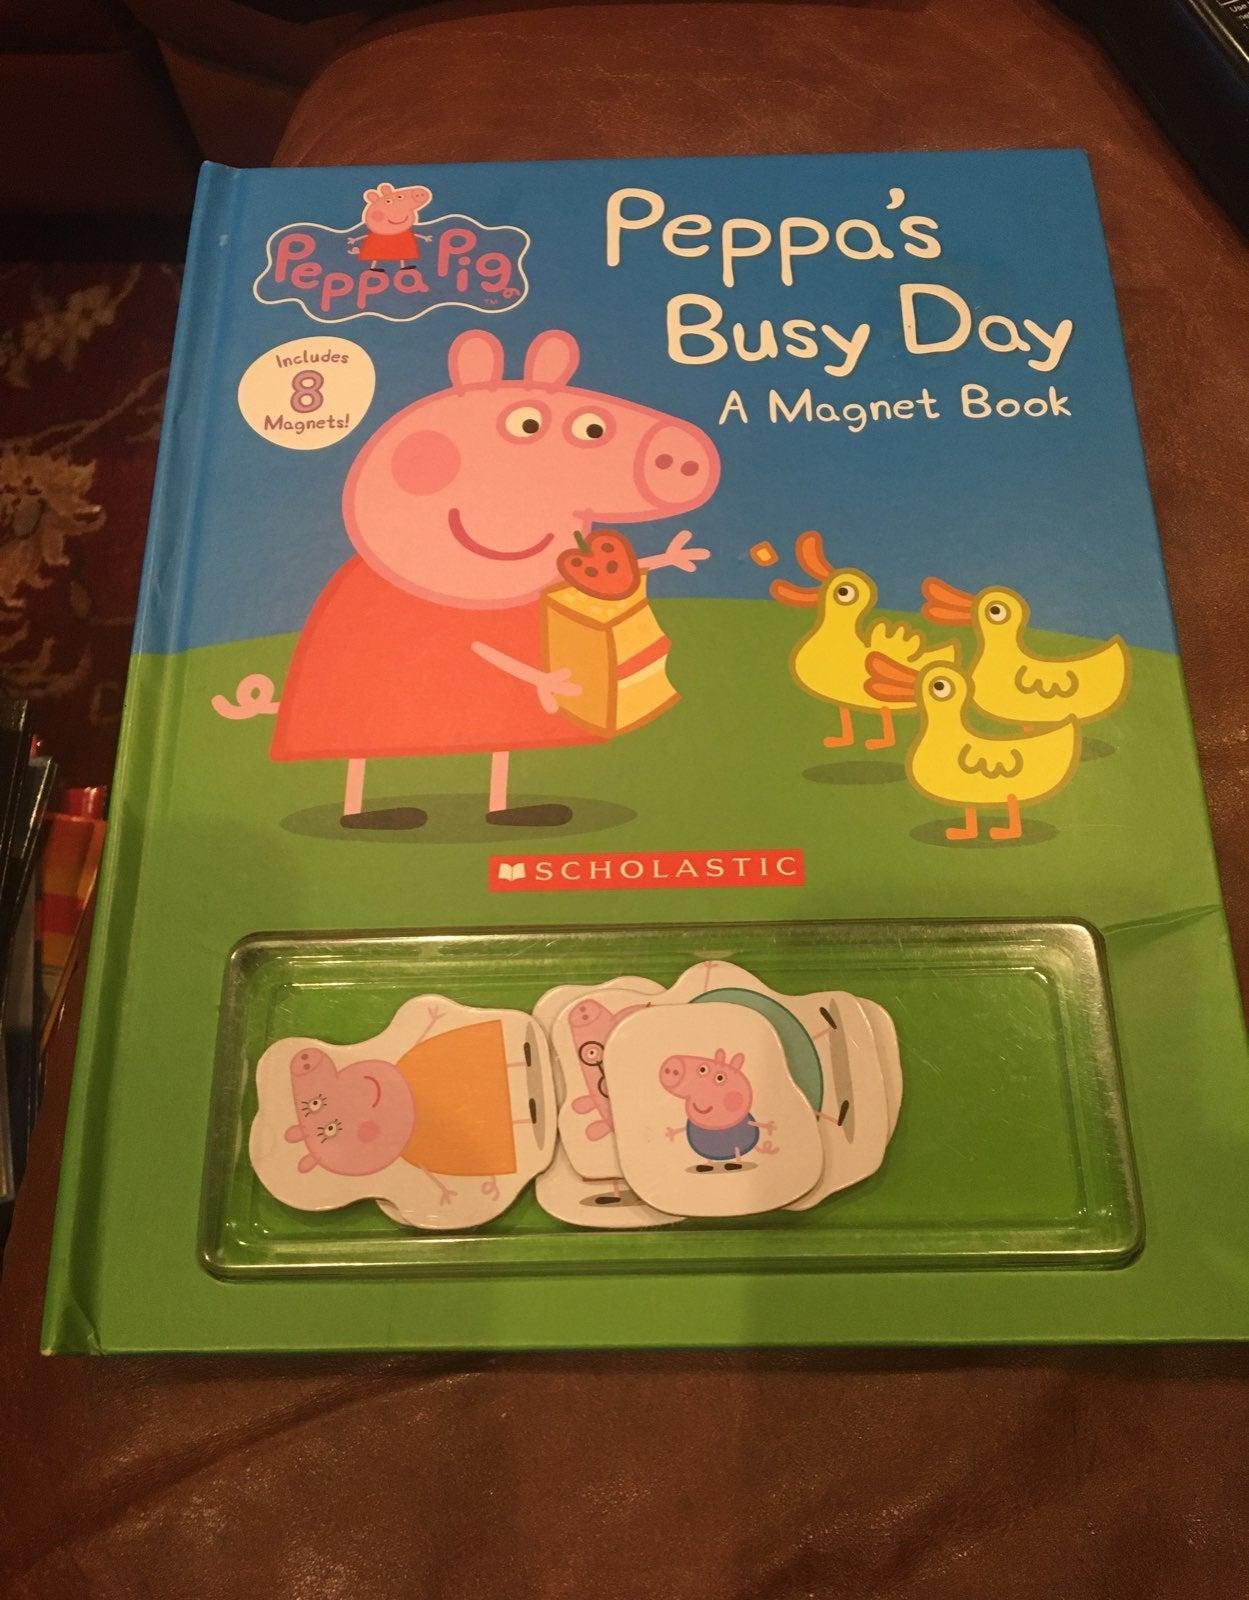 Peppa Pig mangetic book New